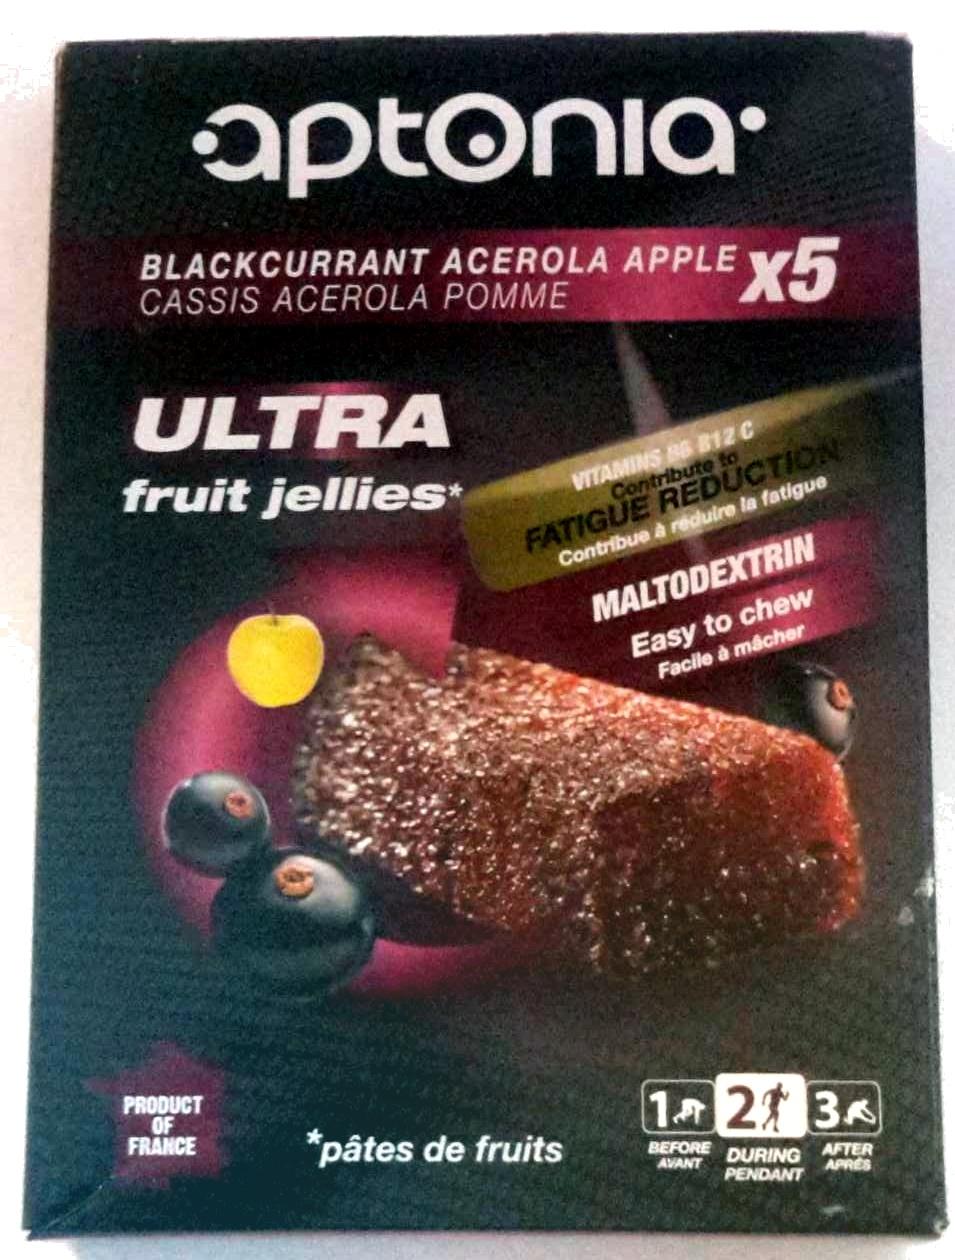 Ultra fruit jellies - Cassis Acelora Pomme - Prodotto - fr